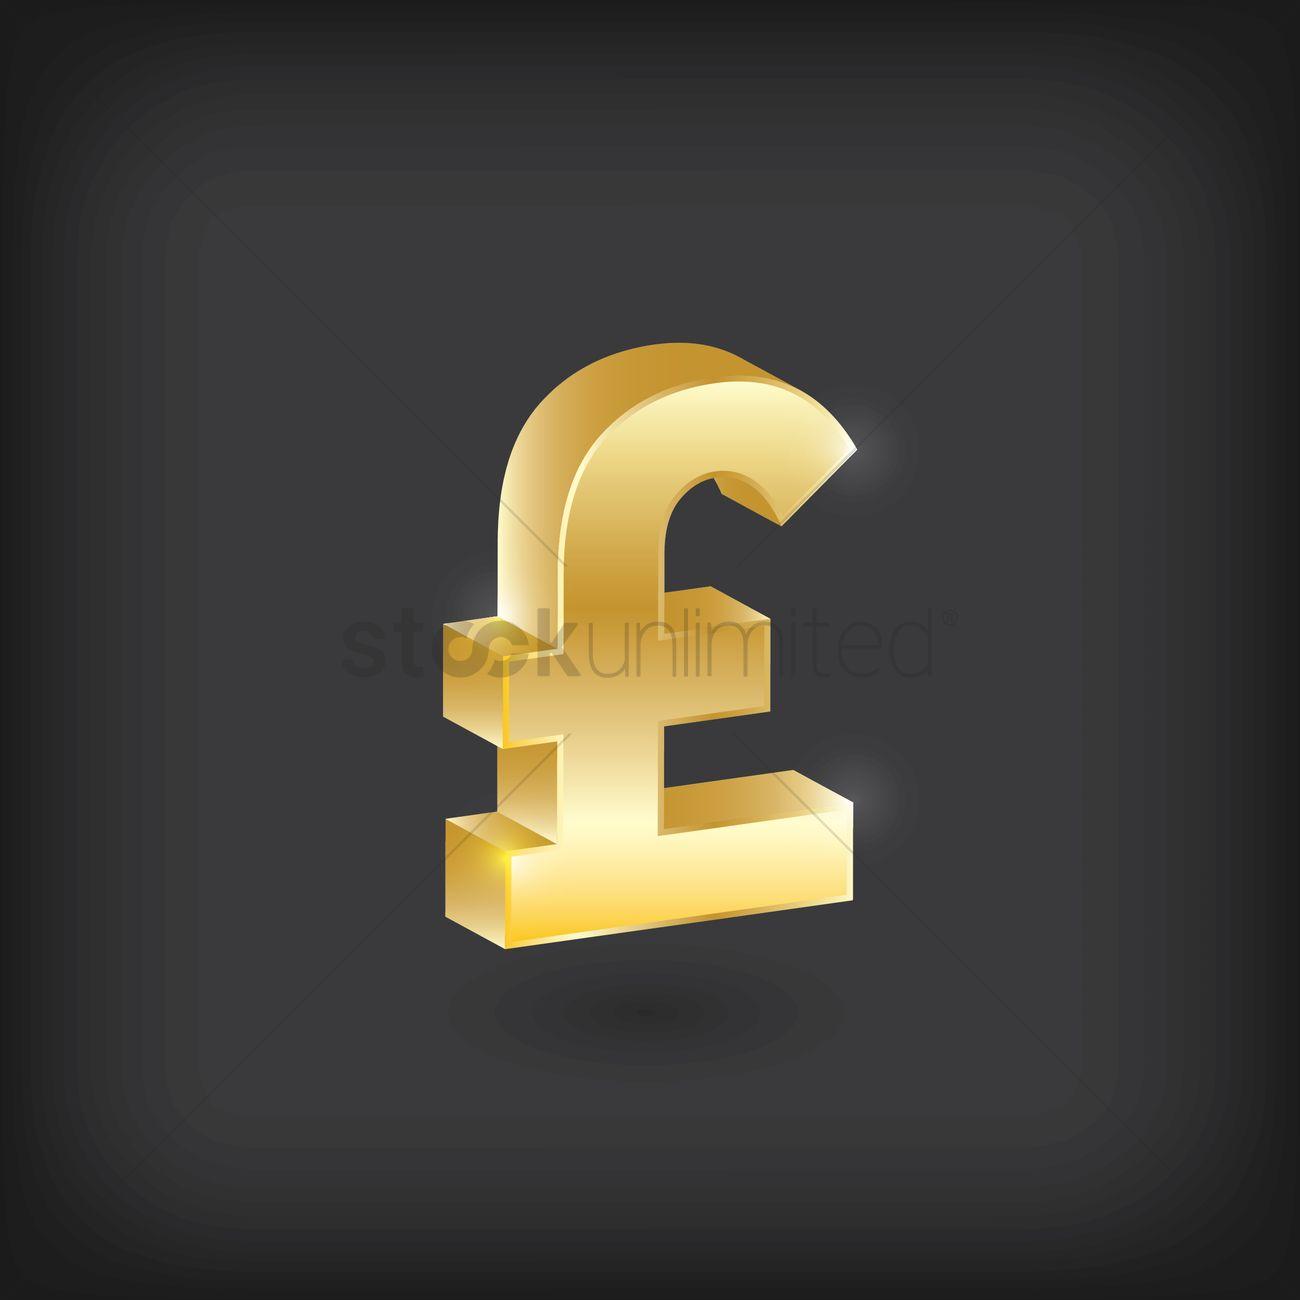 Uk Sterling Pound Symbol Vector Image 1870905 Stockunlimited